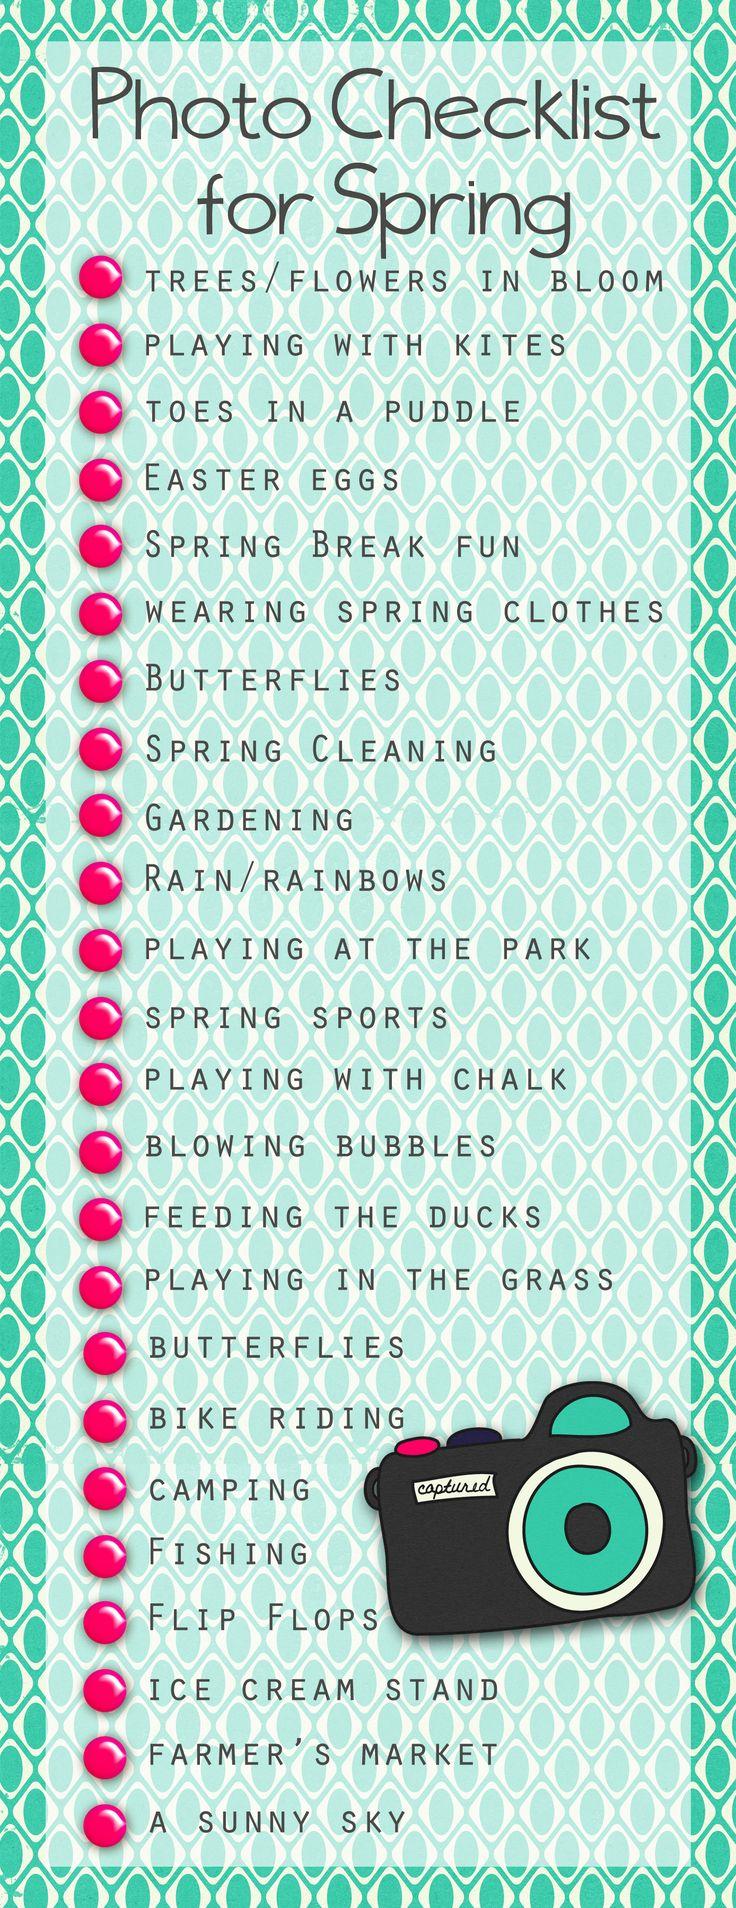 Spring Photo Checklist from Shawna Clingerman's blog.